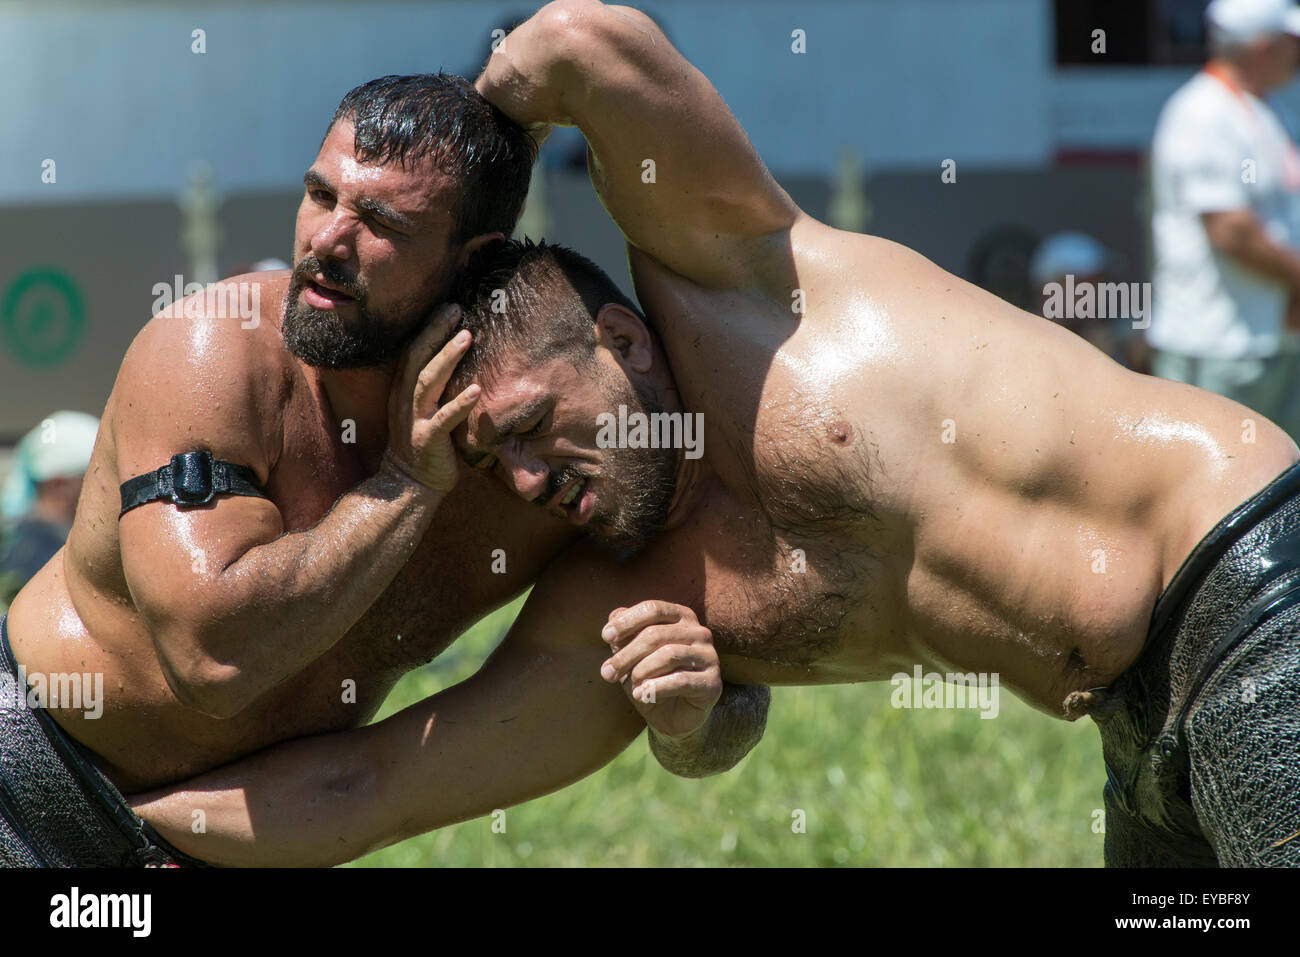 latex ol wrestling